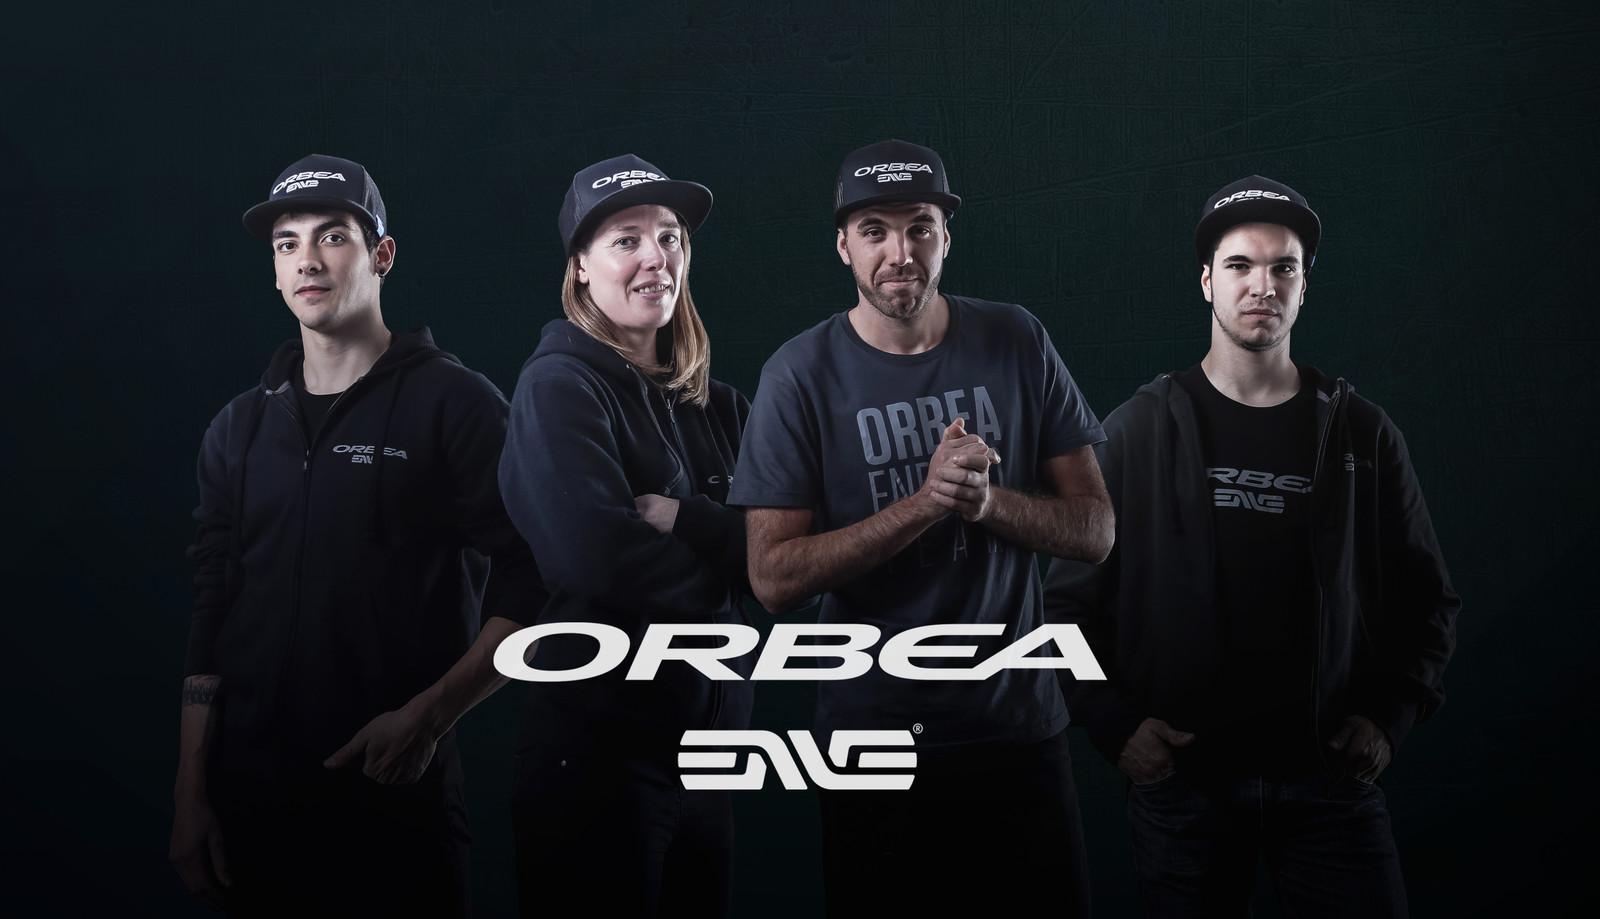 Orbea Enduro Team - The beginning of Enduralin